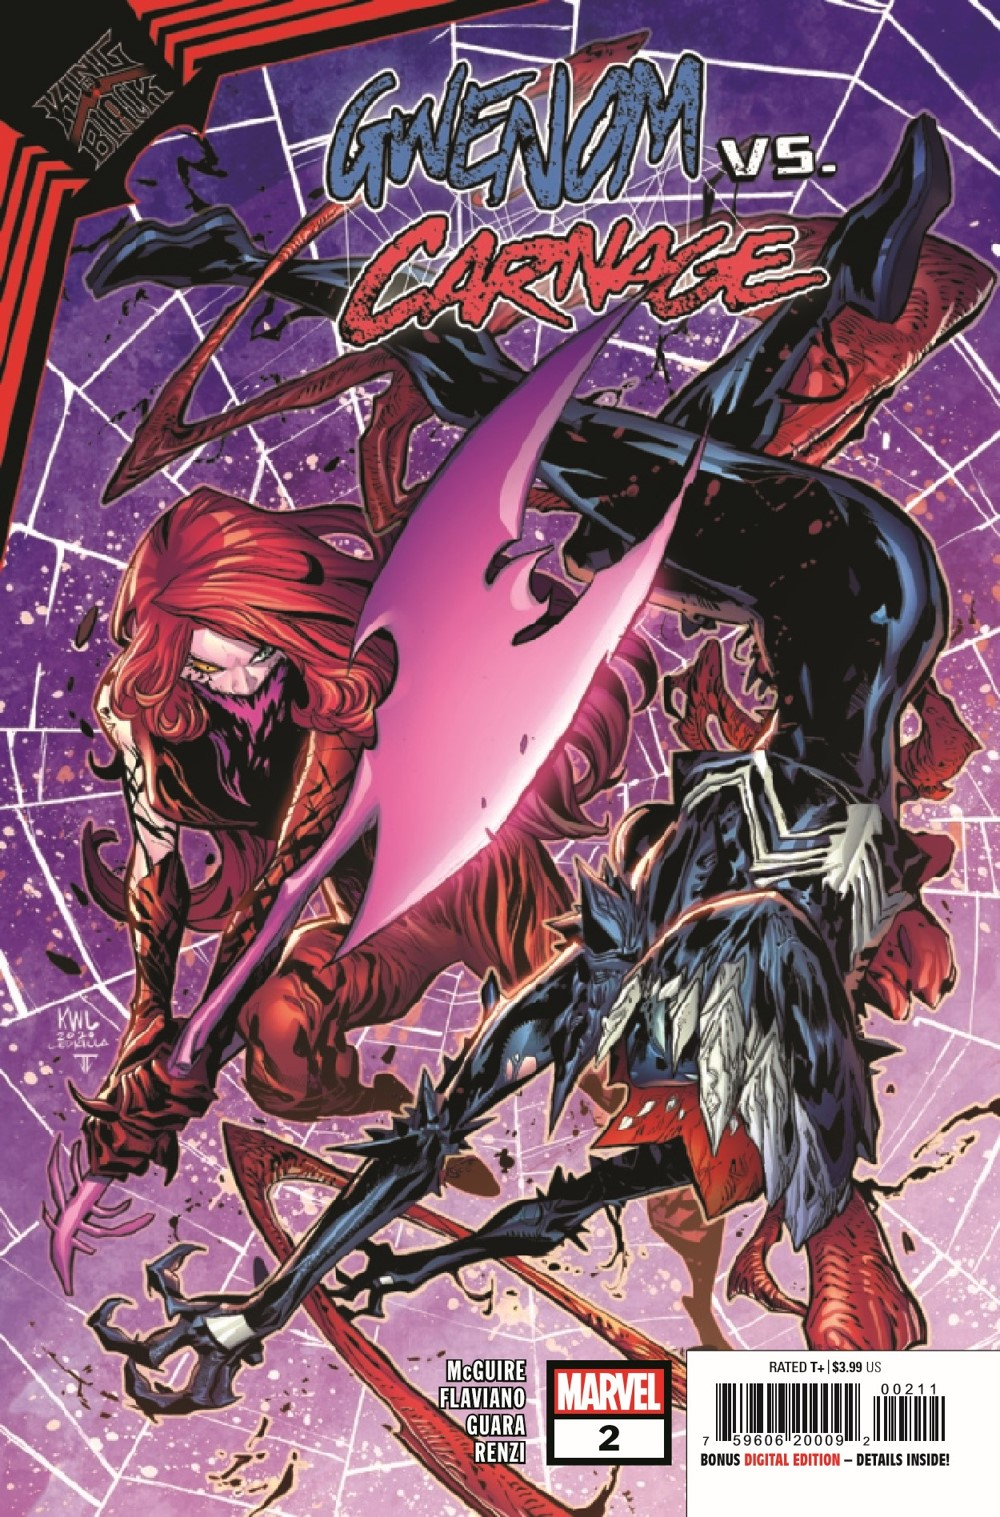 GWENOMVSCARNKIB2021002_Preview-1 ComicList Previews: KING IN BLACK GWENOM VS CARNAGE #2 (OF 3)